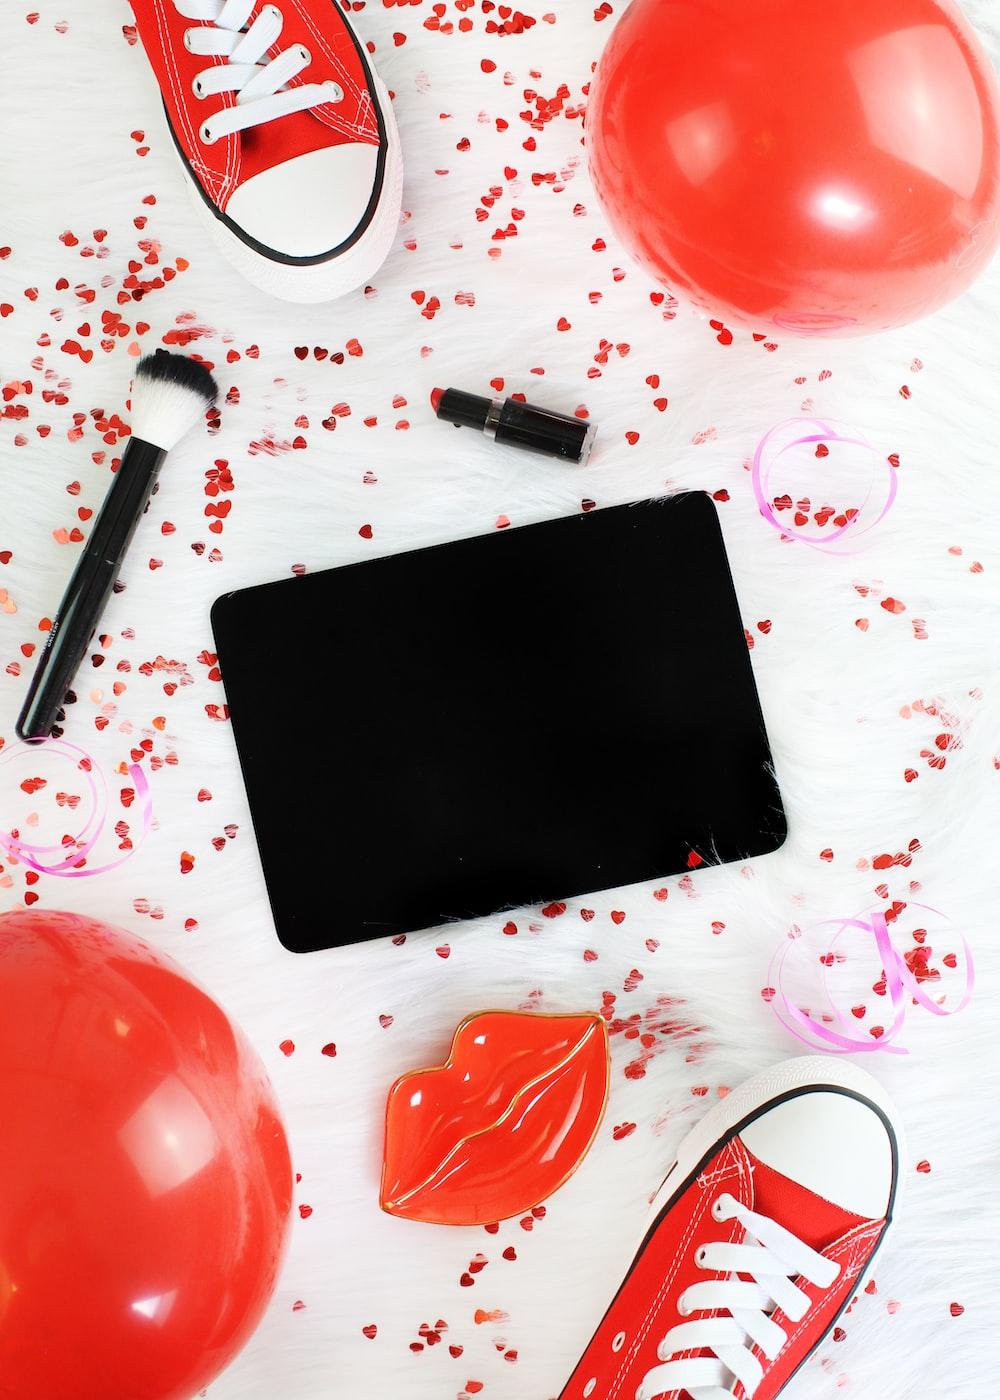 black tablet computer, makeup brush, lipstick, and balloon on floor